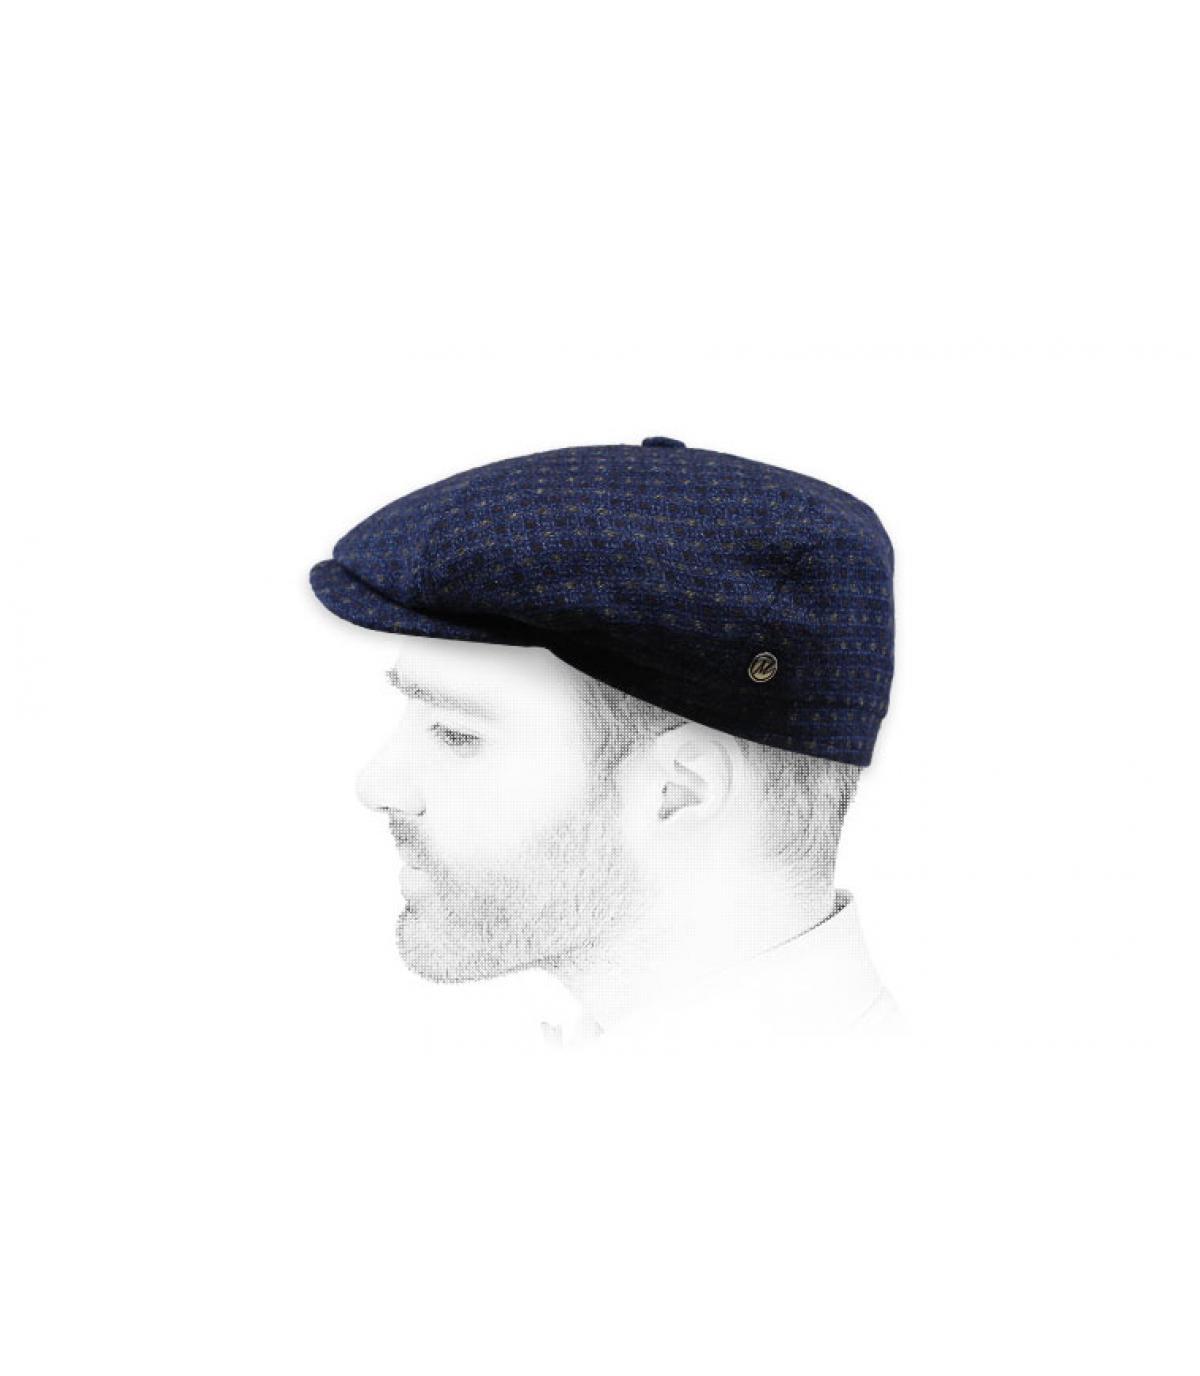 baret marineblauw kasjmier wol